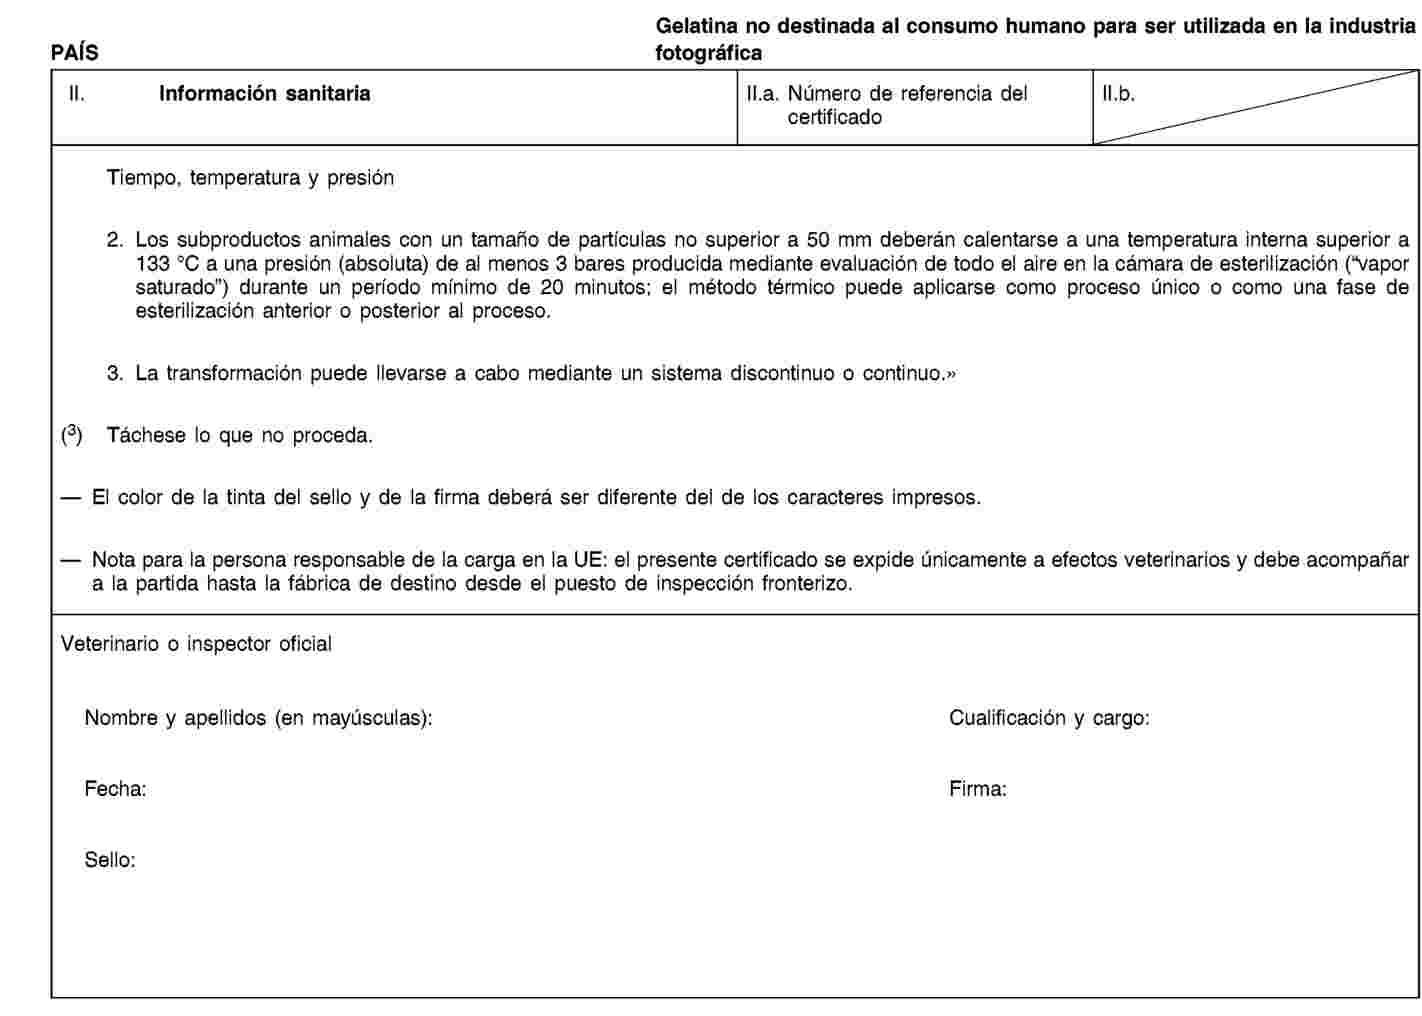 Imagen: https://eur-lex.europa.eu/resource.html?uri=uriserv:OJ.L_.2011.054.01.0001.01.SPA.xhtml.L_2011054ES.01024401.tif.jpg